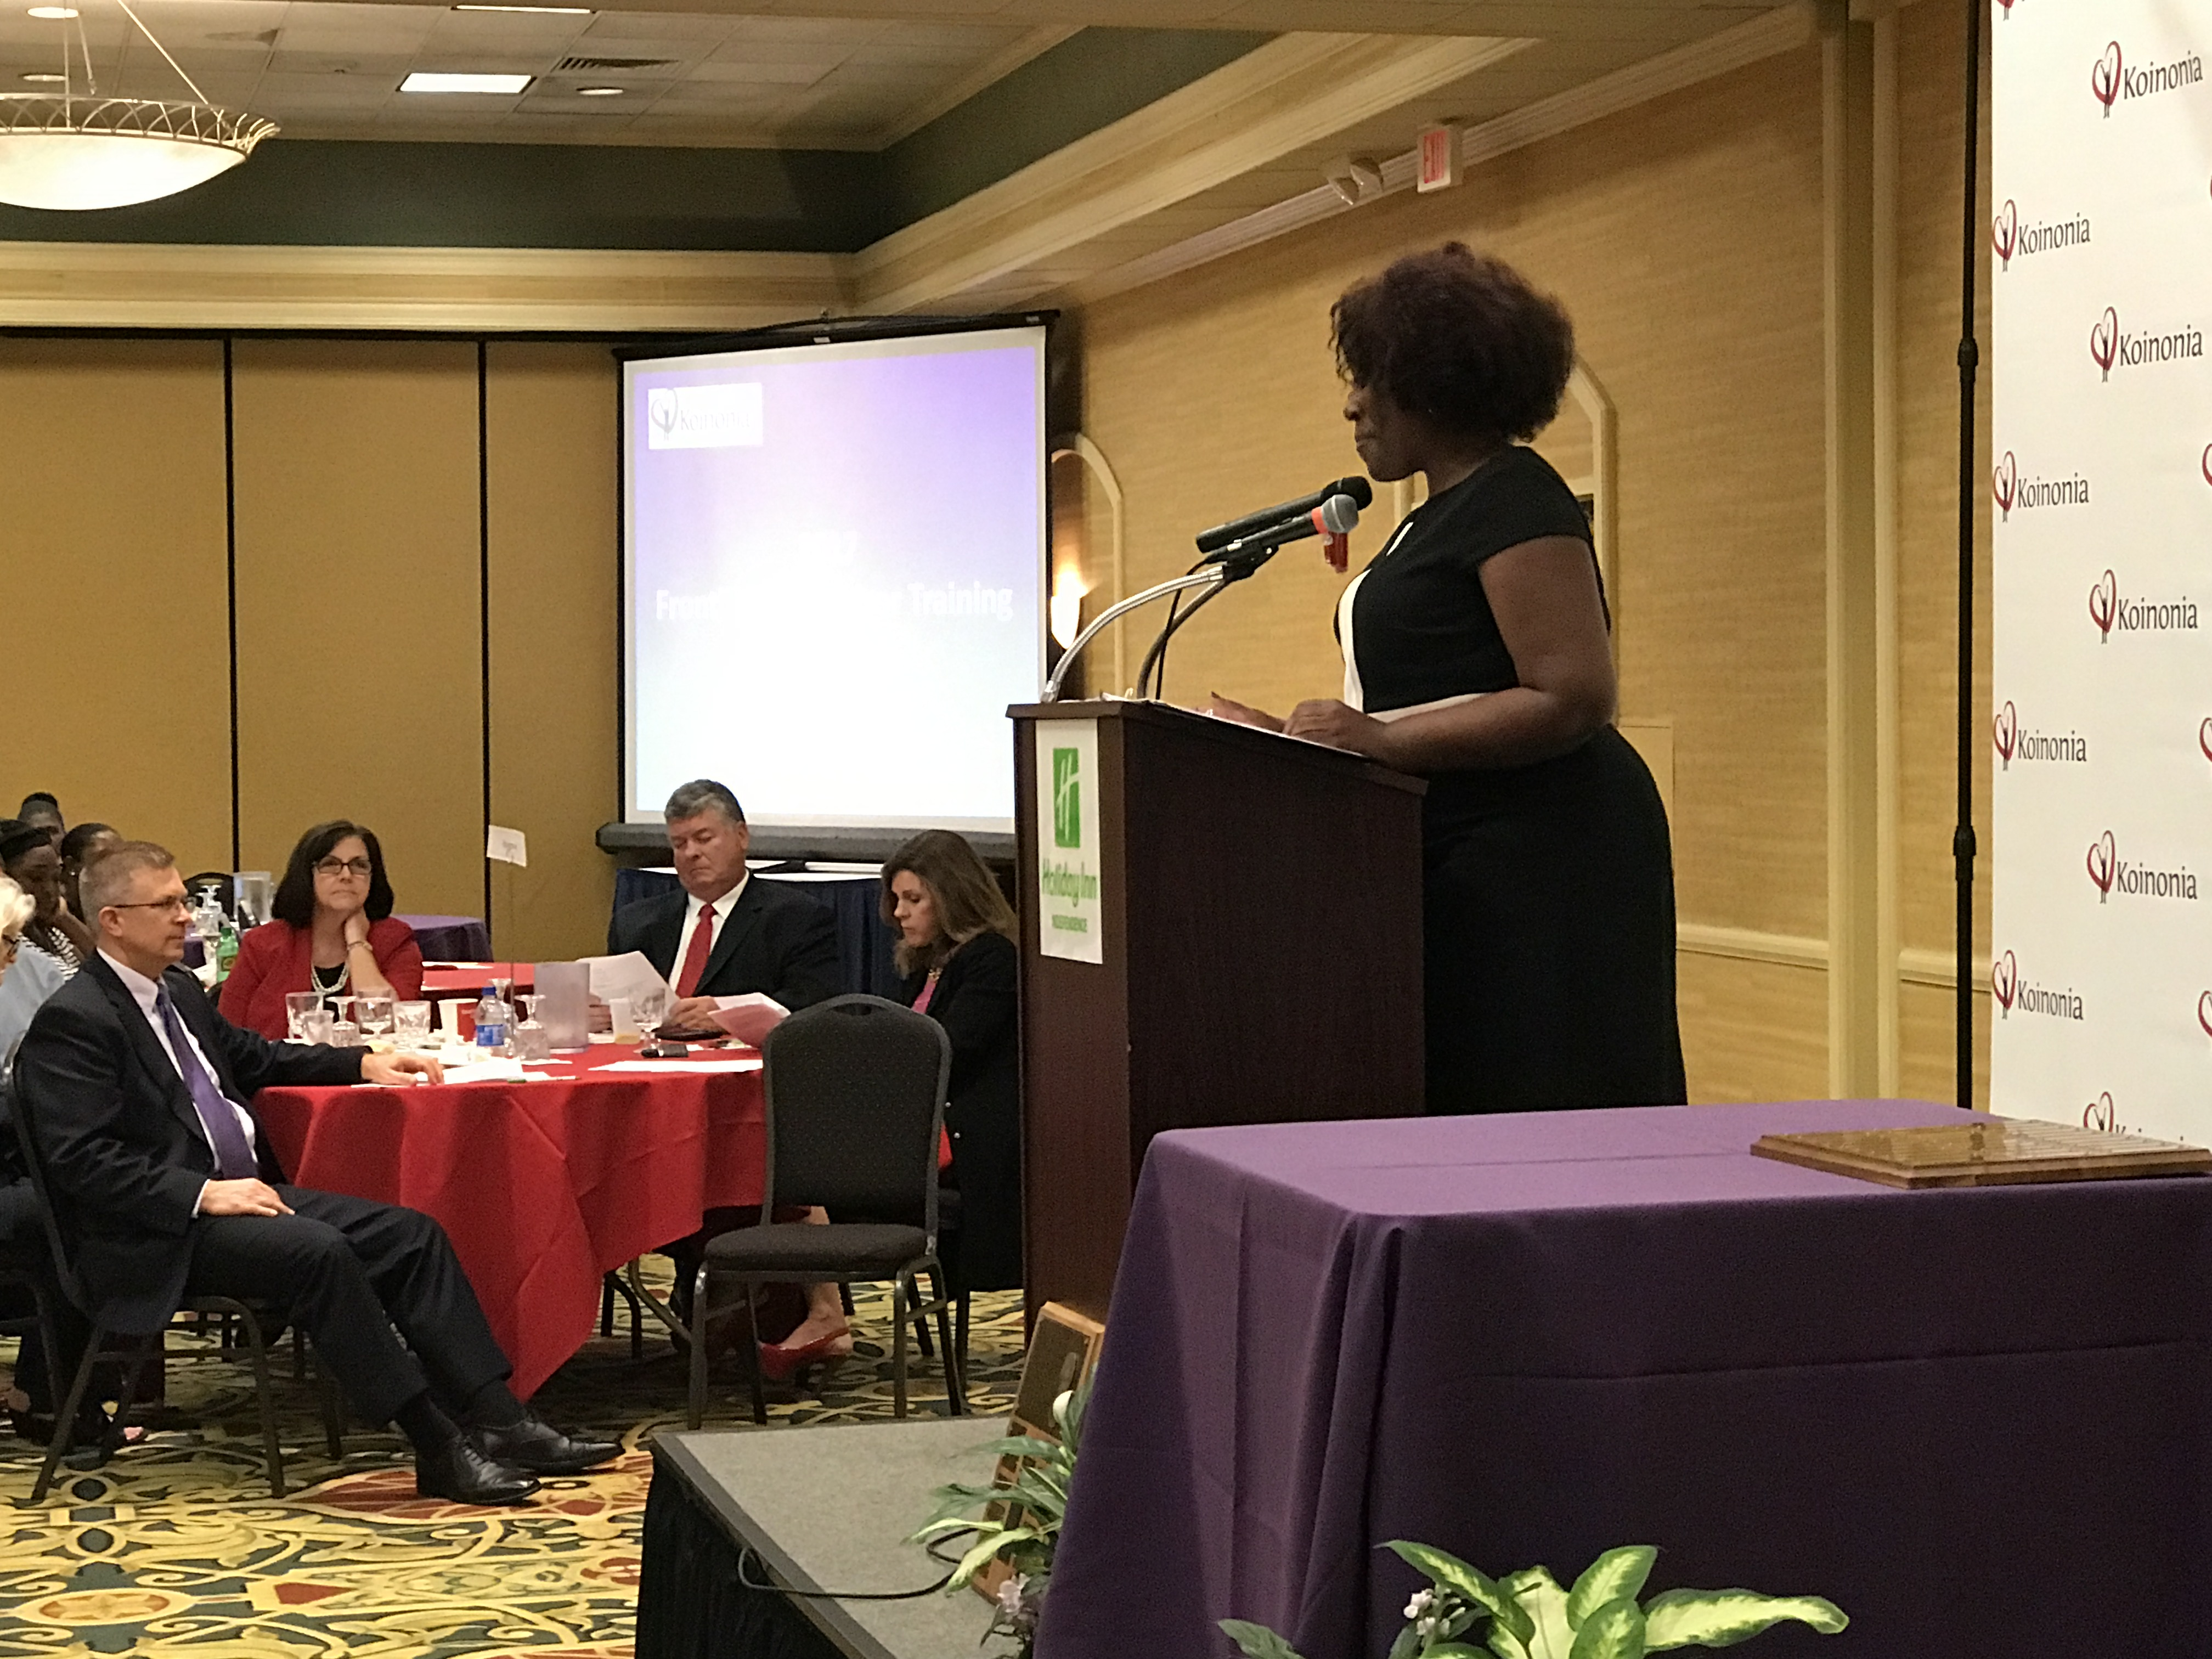 Vanessa Lee presents Frontline Supervisor Awards